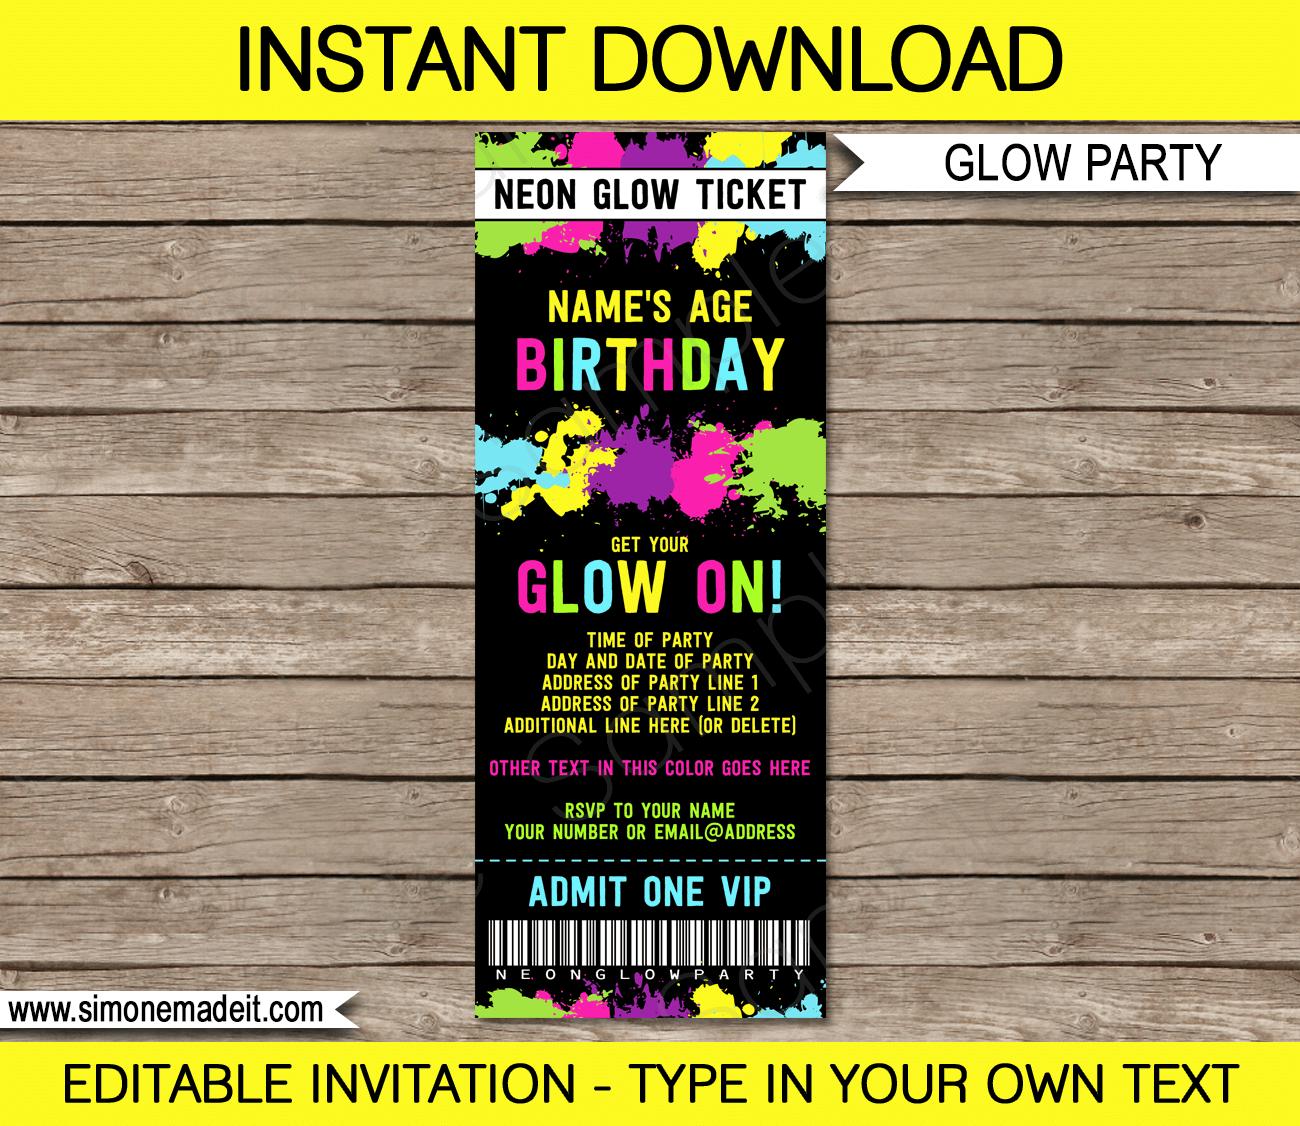 Printable Glow In The Dark Ticket Birthday Invitation Disco Dance - Party invitation template: free email birthday party invitation templates